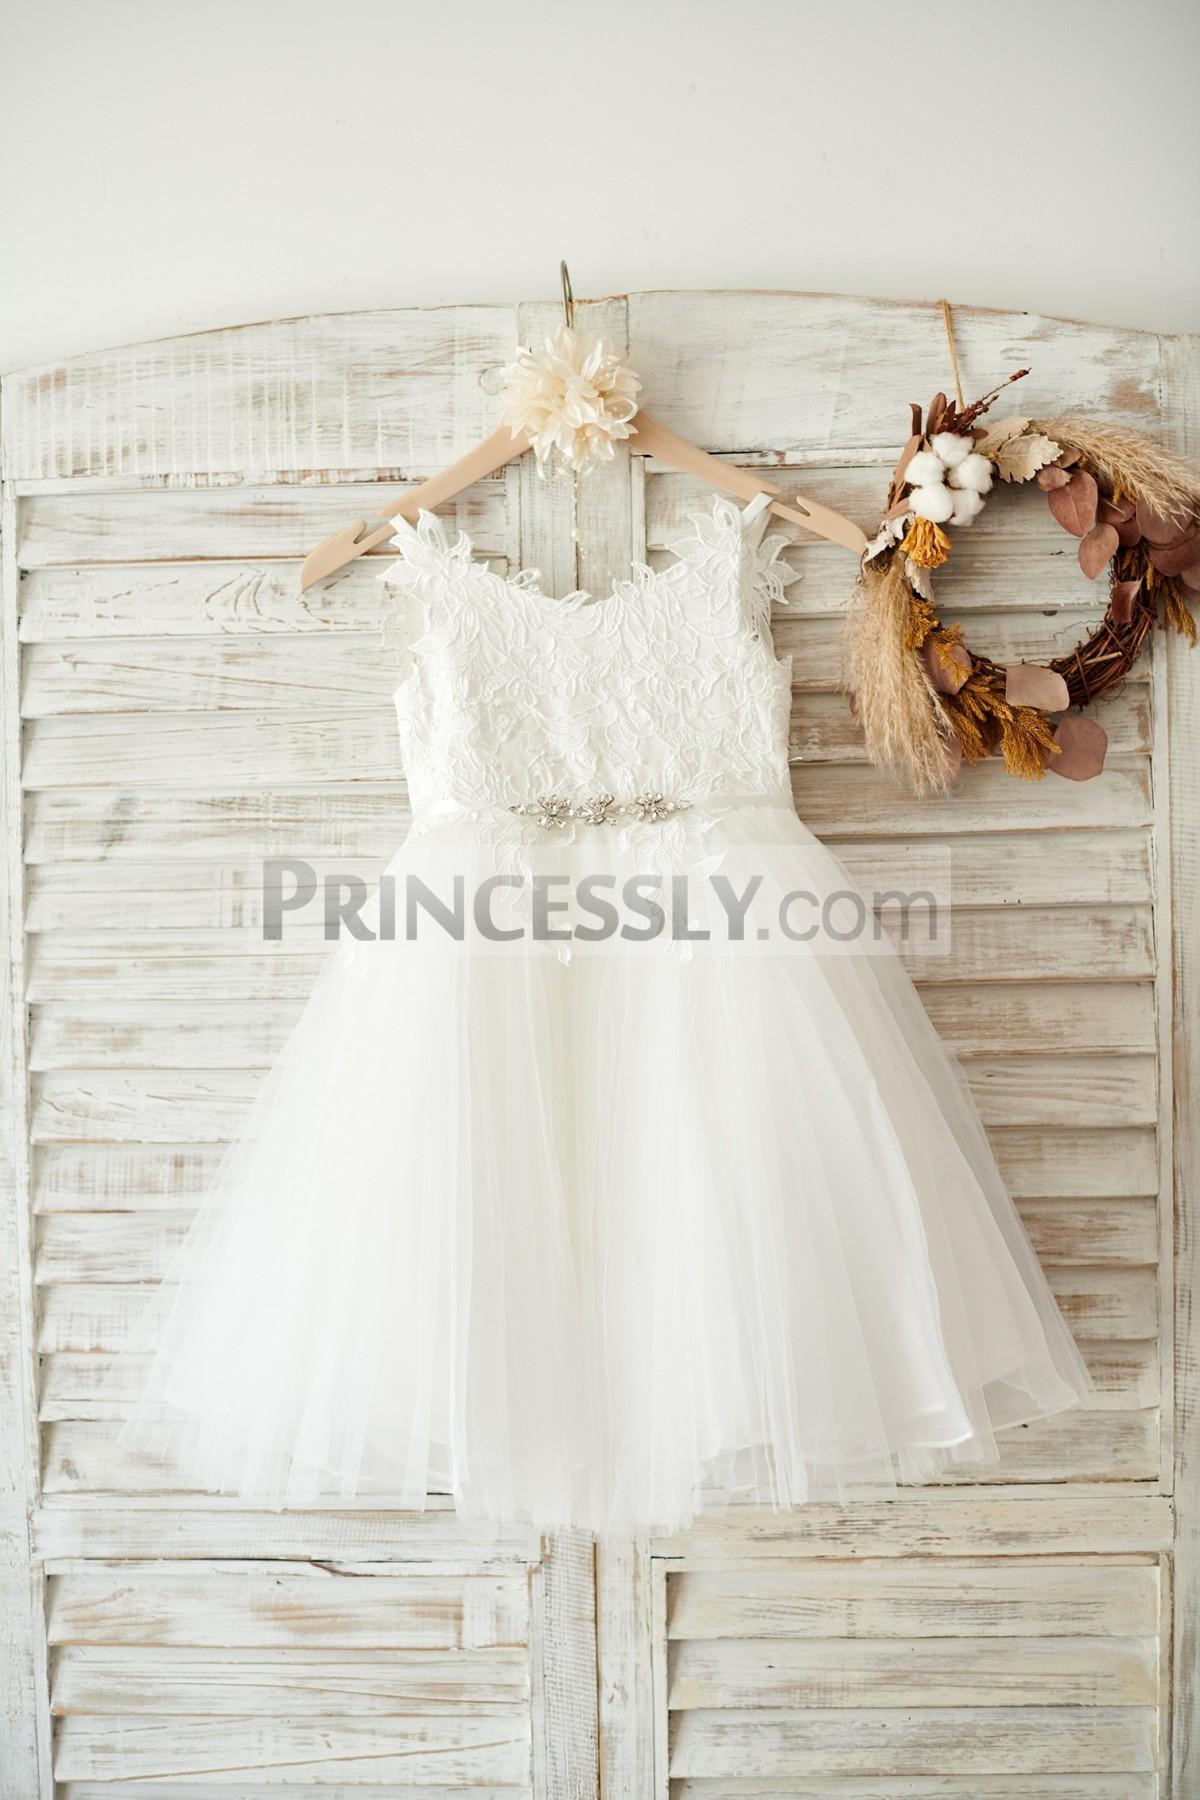 Princessly.com-K1003817-Ivory lace Tulle Spaghetti straps Wedding Flower Girl Dress with Beaded Belt-31